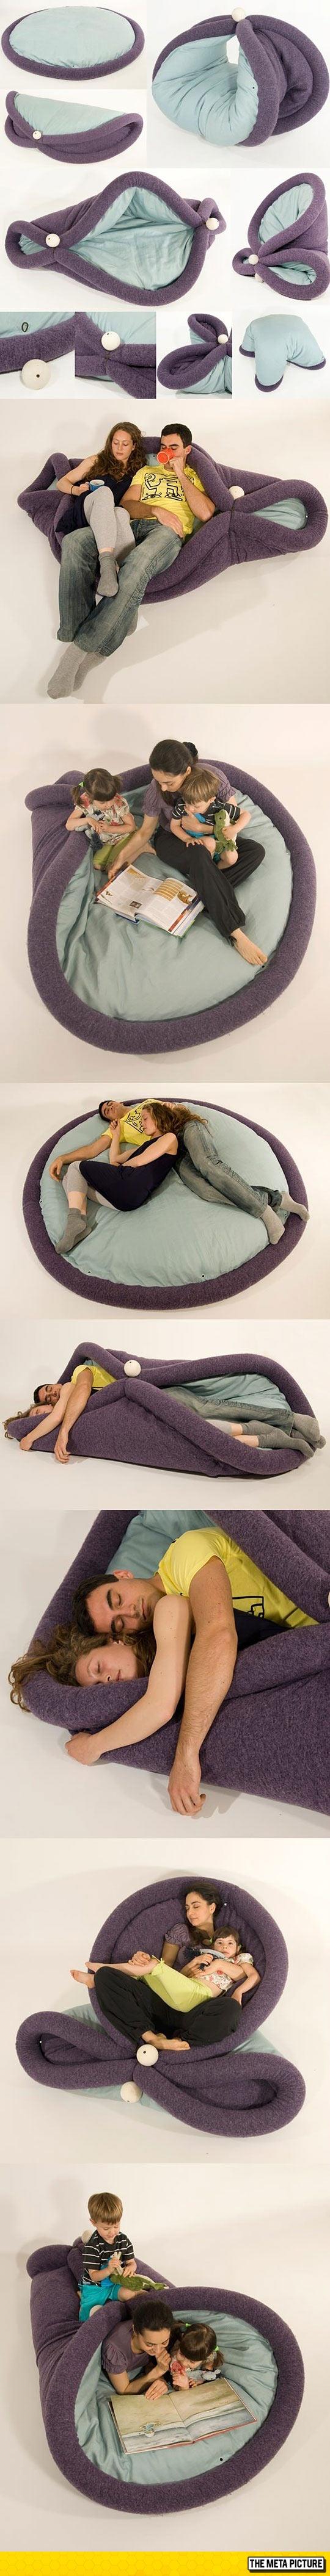 cool-design-carpet-pillow-living-room